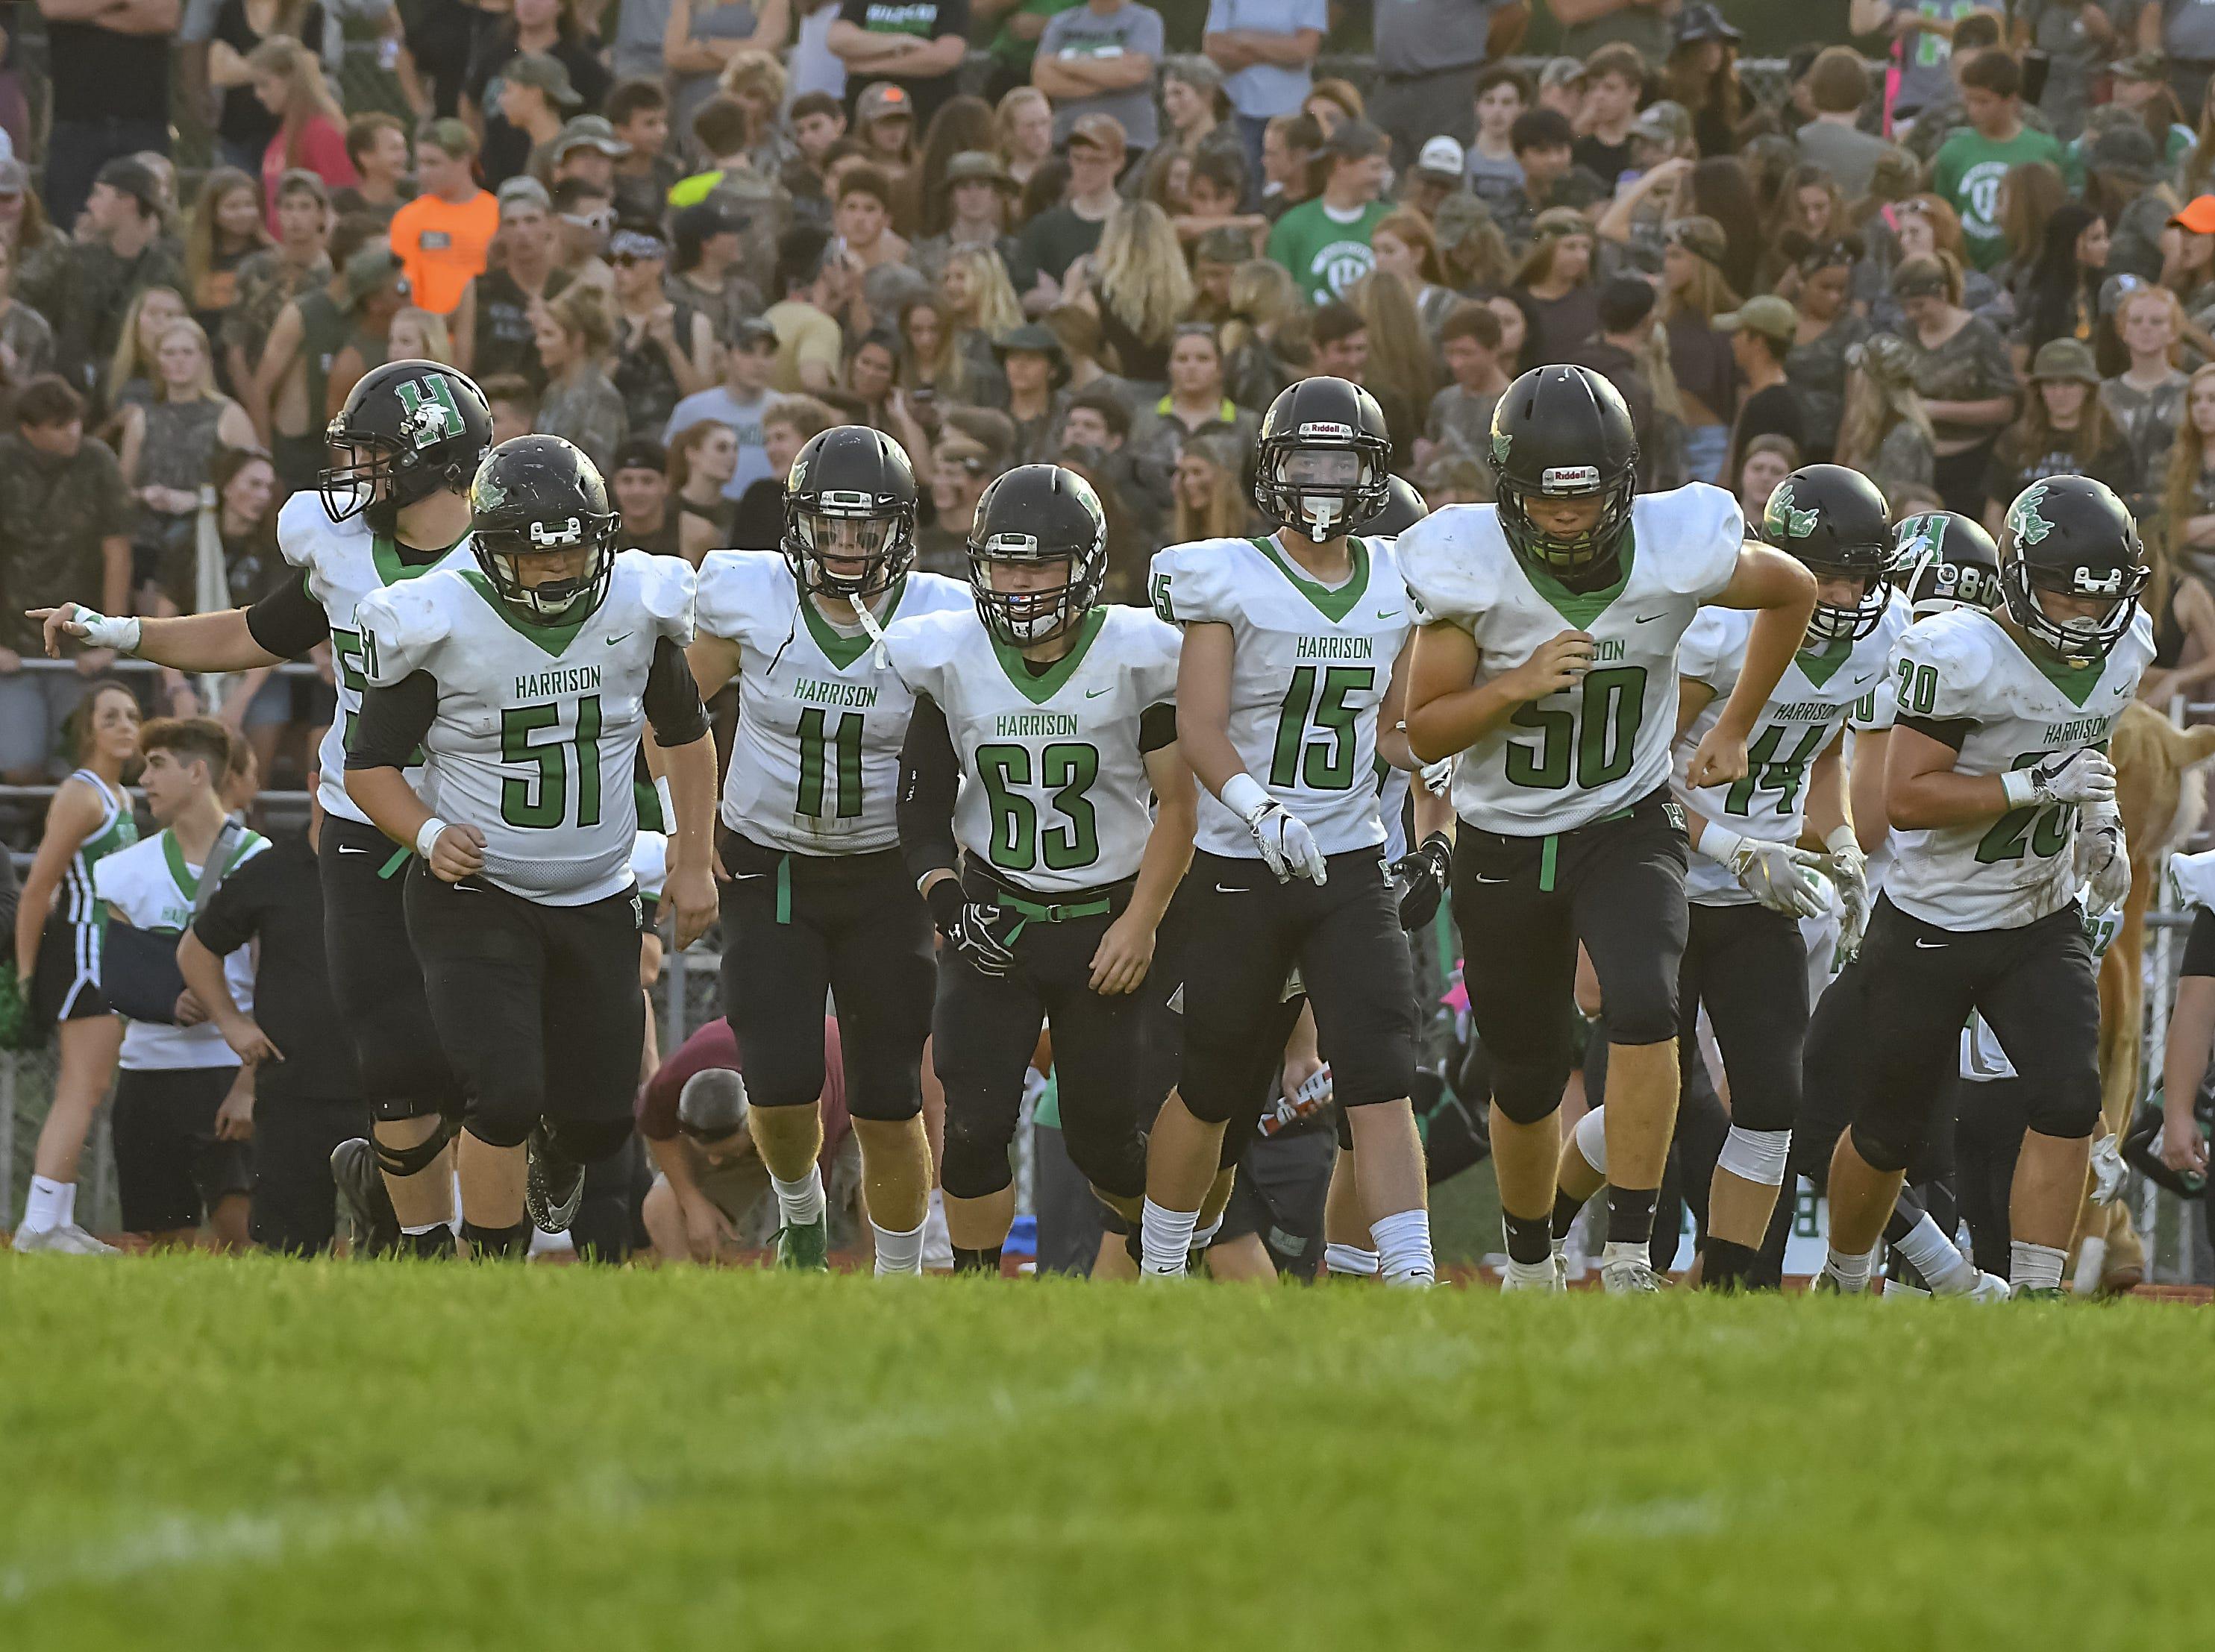 The Harrison offense runs on the field, Ross High School, Friday, September 14, 2018